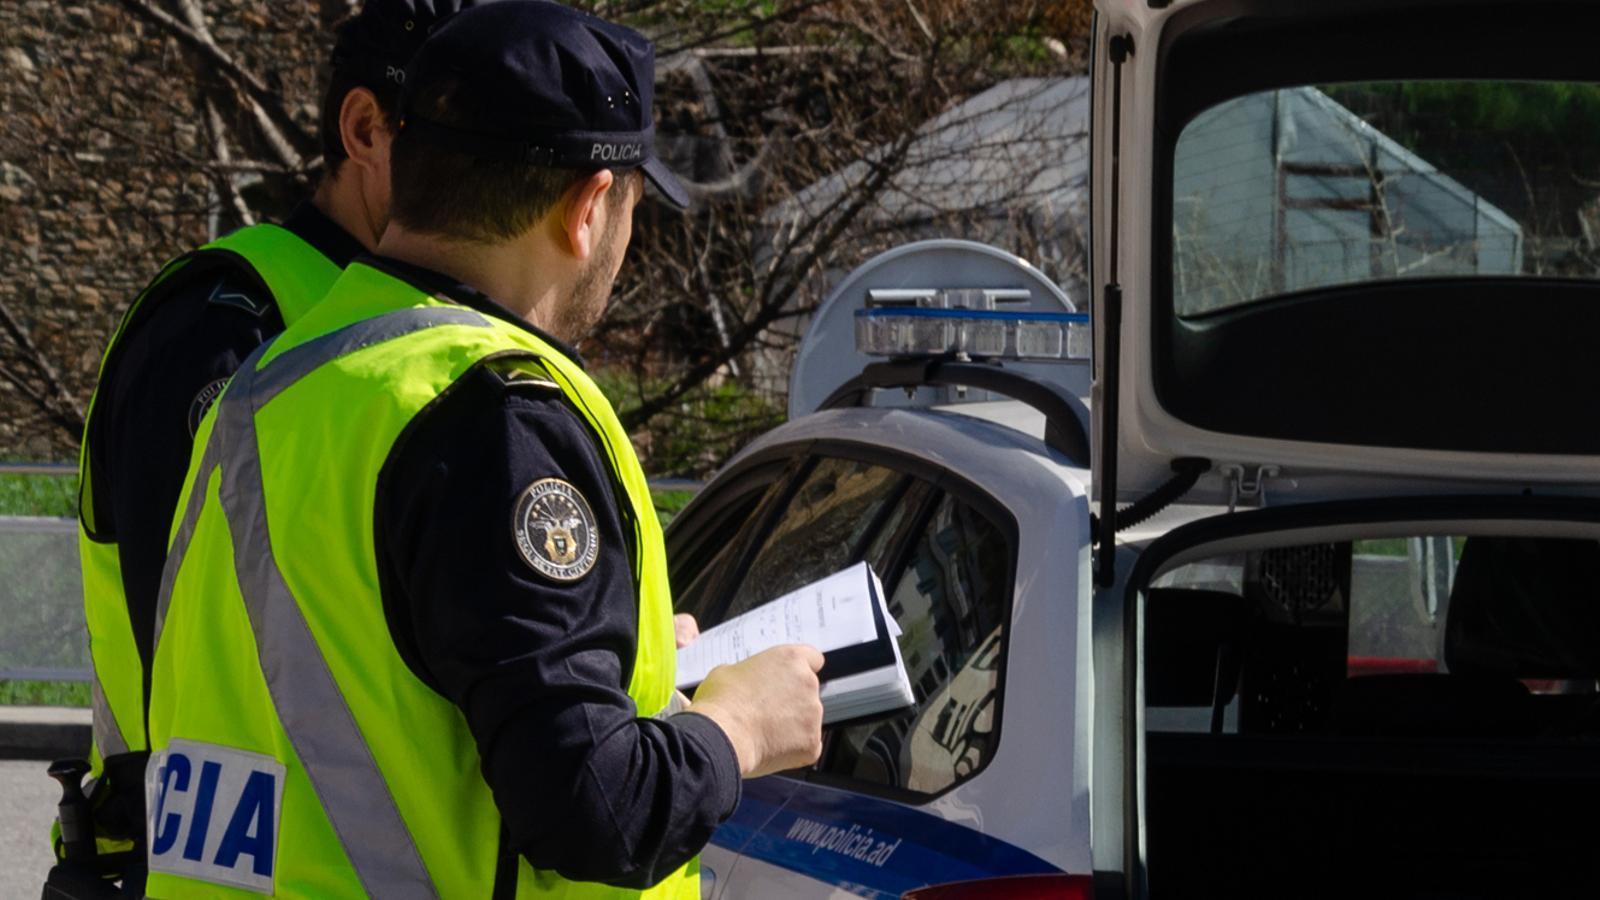 Agents de policia en un control de trànsit. / ARXIU ANA